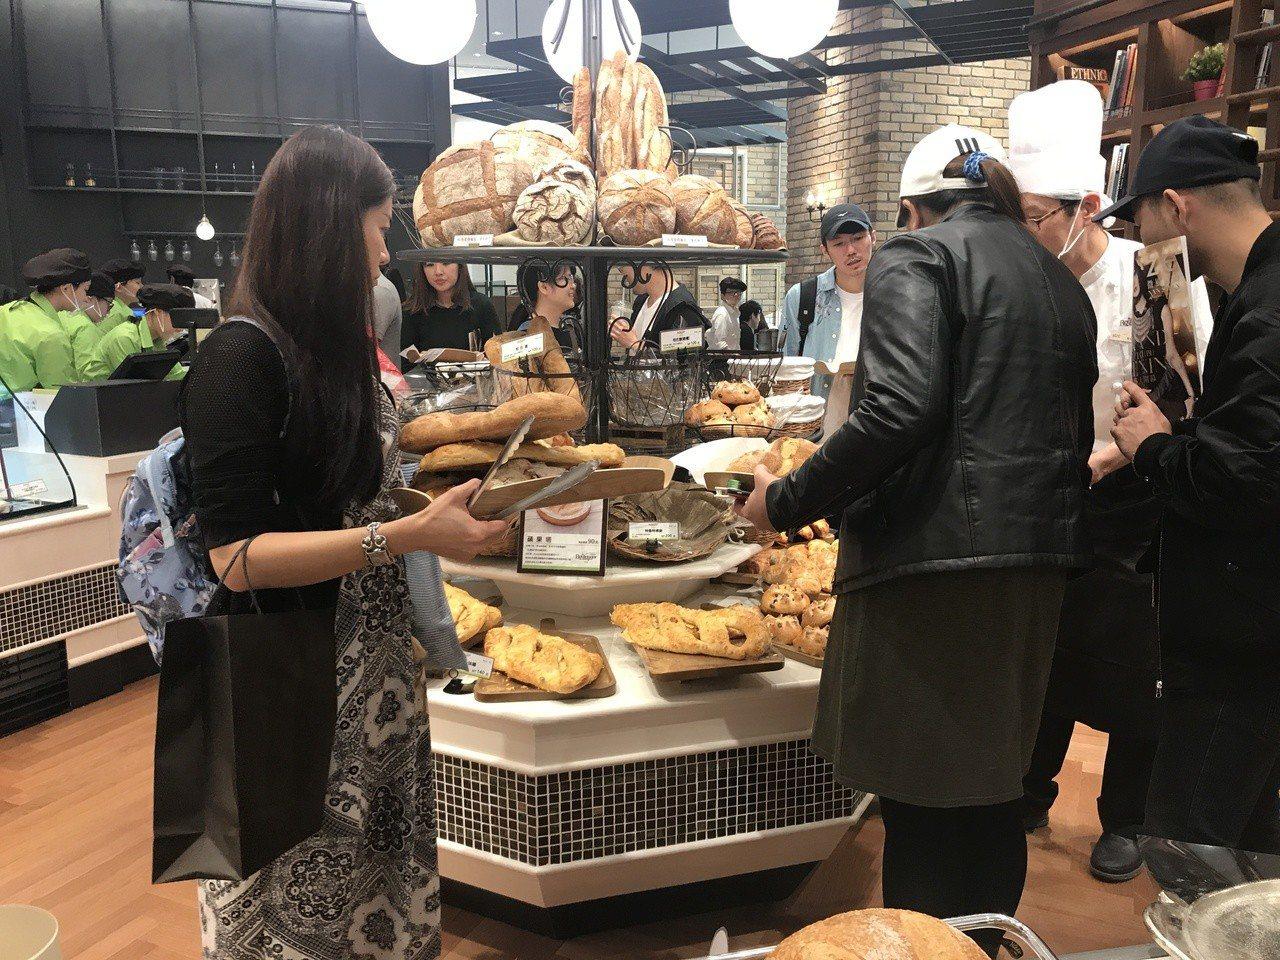 le Boulanger de monge一開幕店內人氣相當開。記者江佩君/攝影